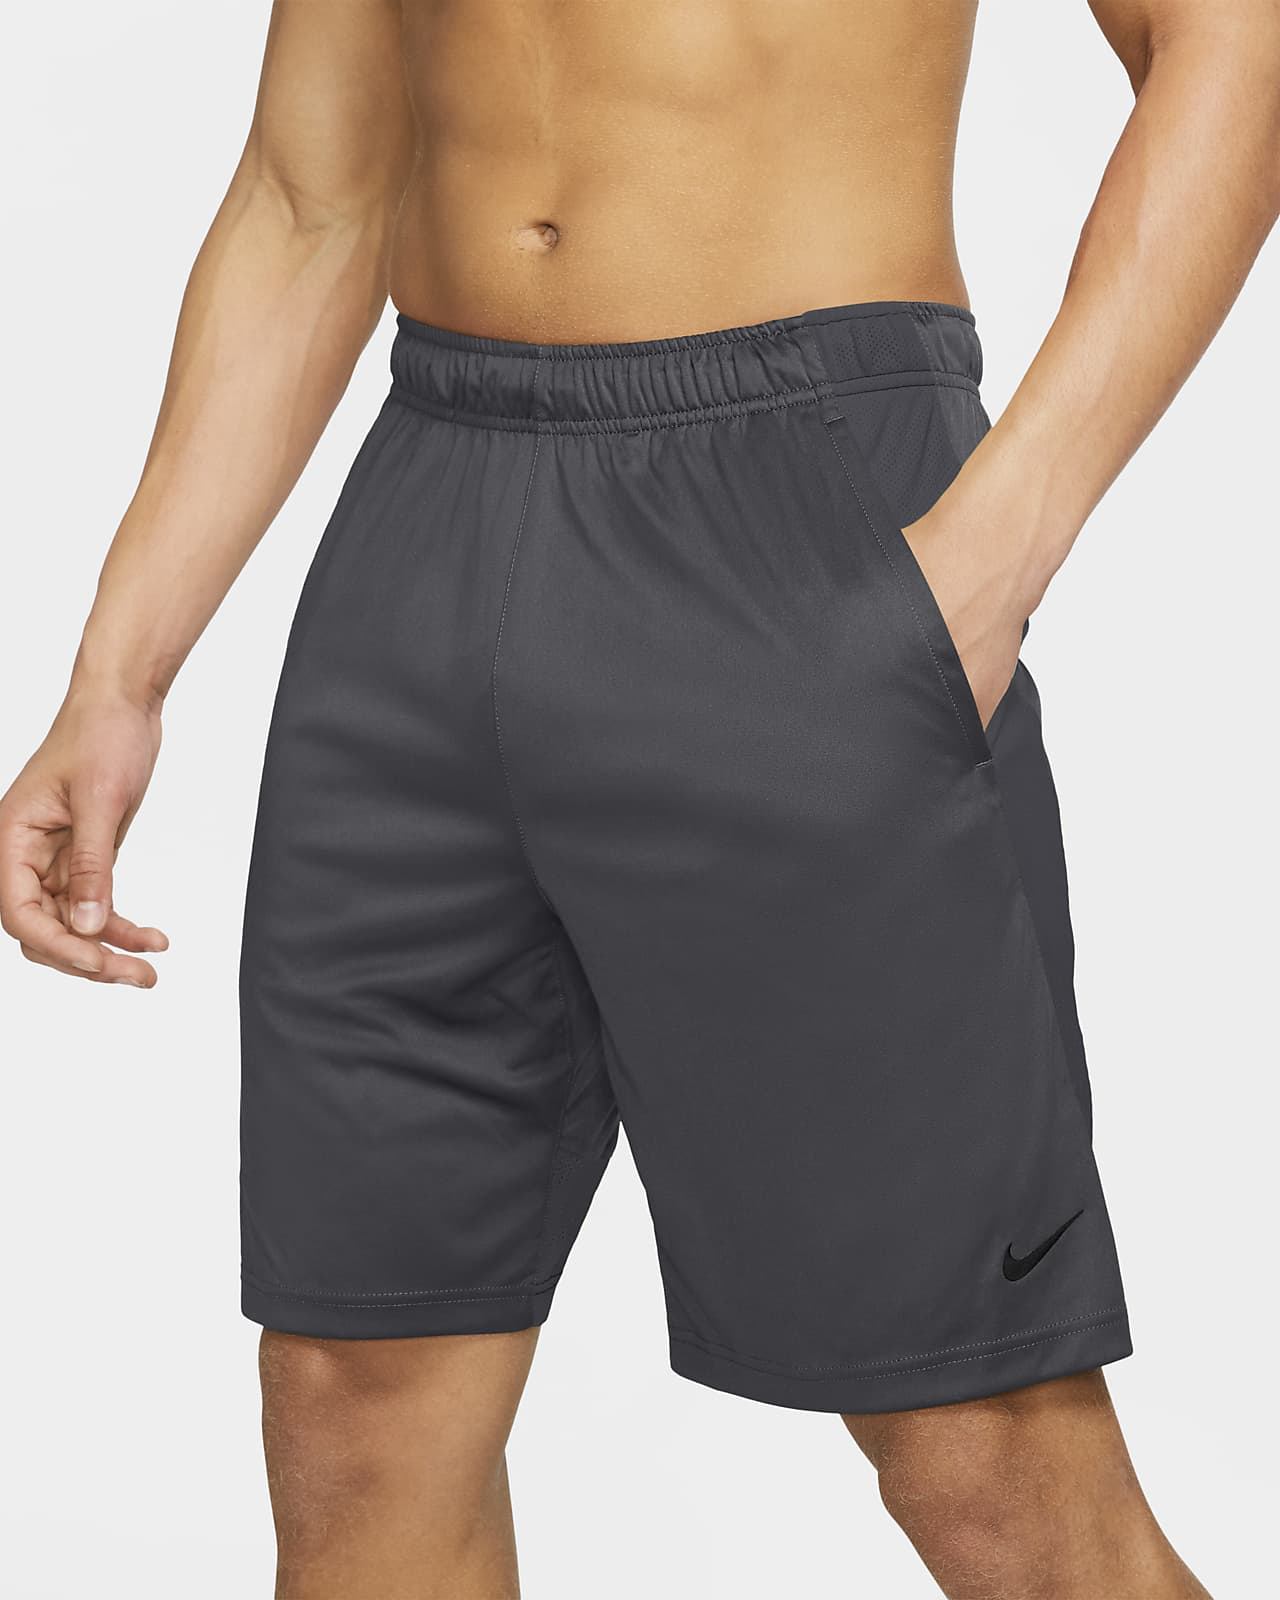 cinta guardarropa Inaccesible  Nike Dri-FIT Men's Training Shorts. Nike.com